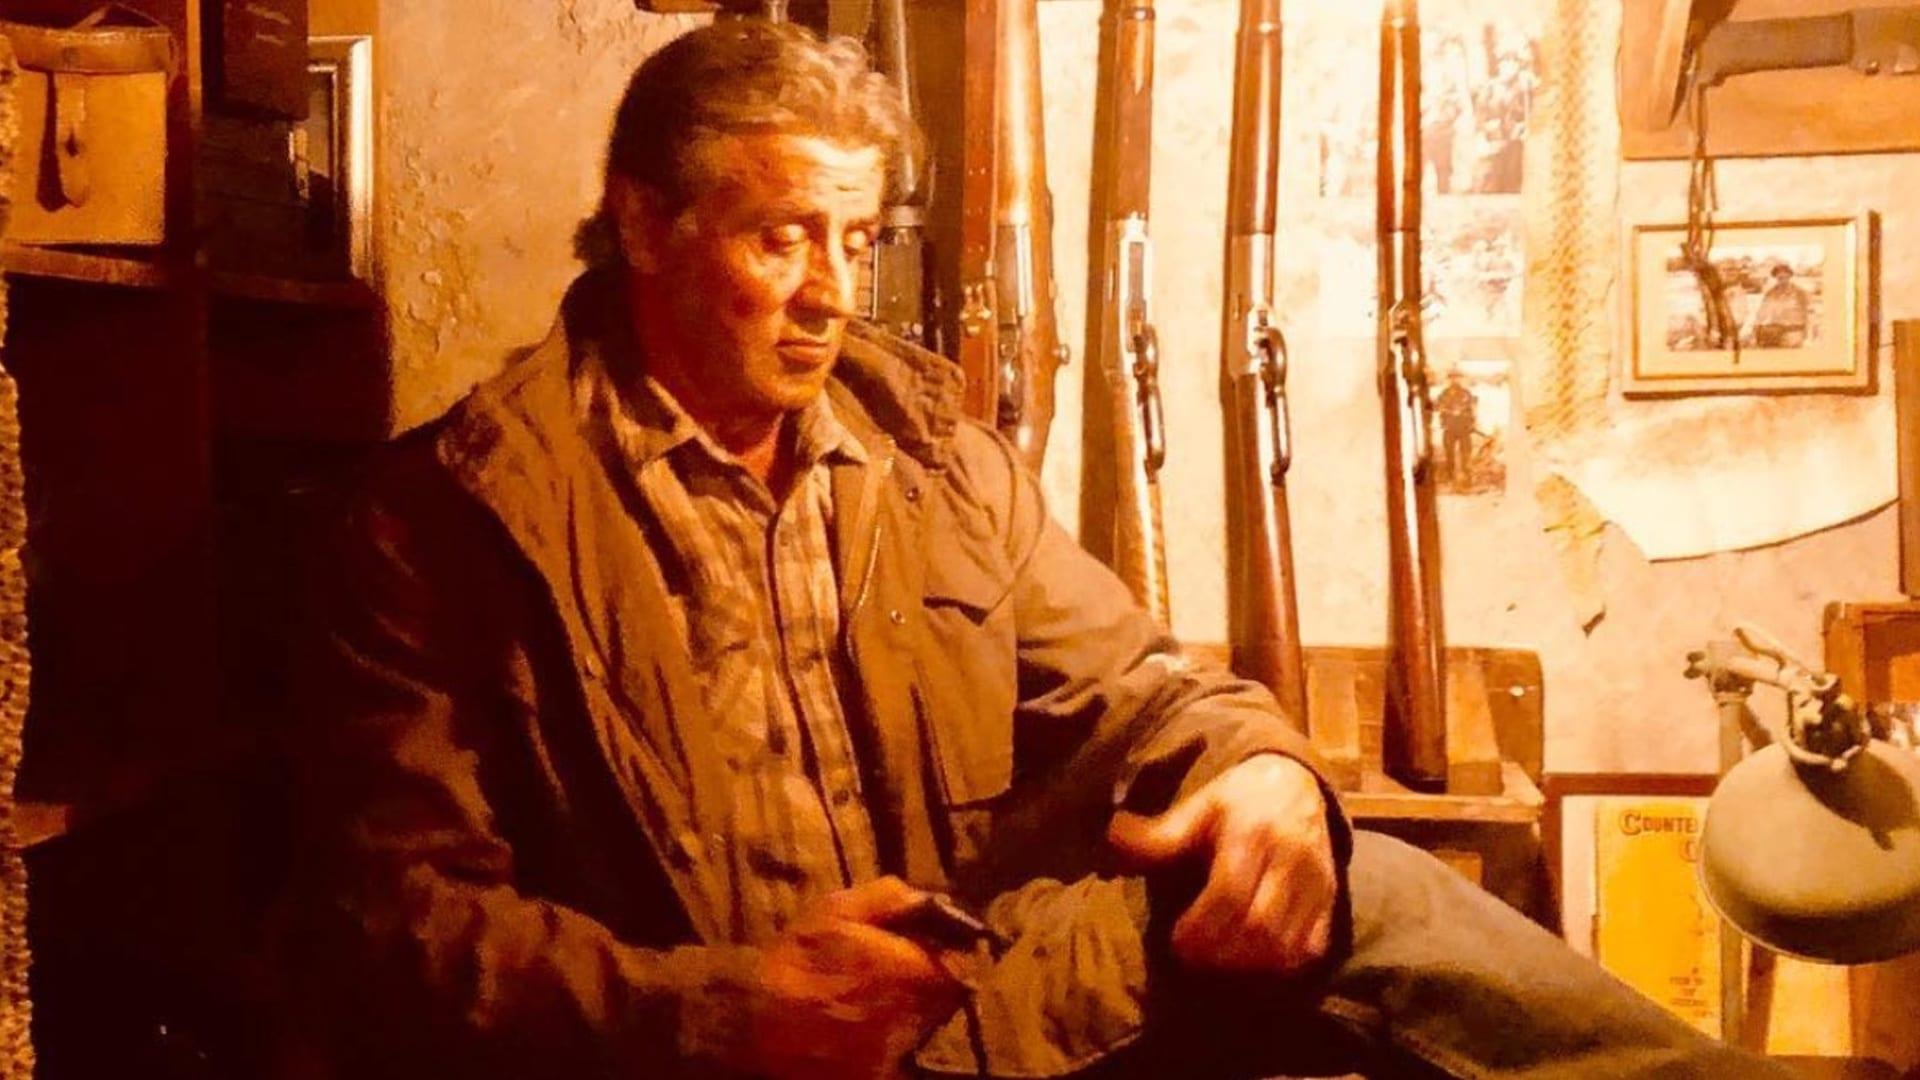 Rambo: Last Blood Trailer #2